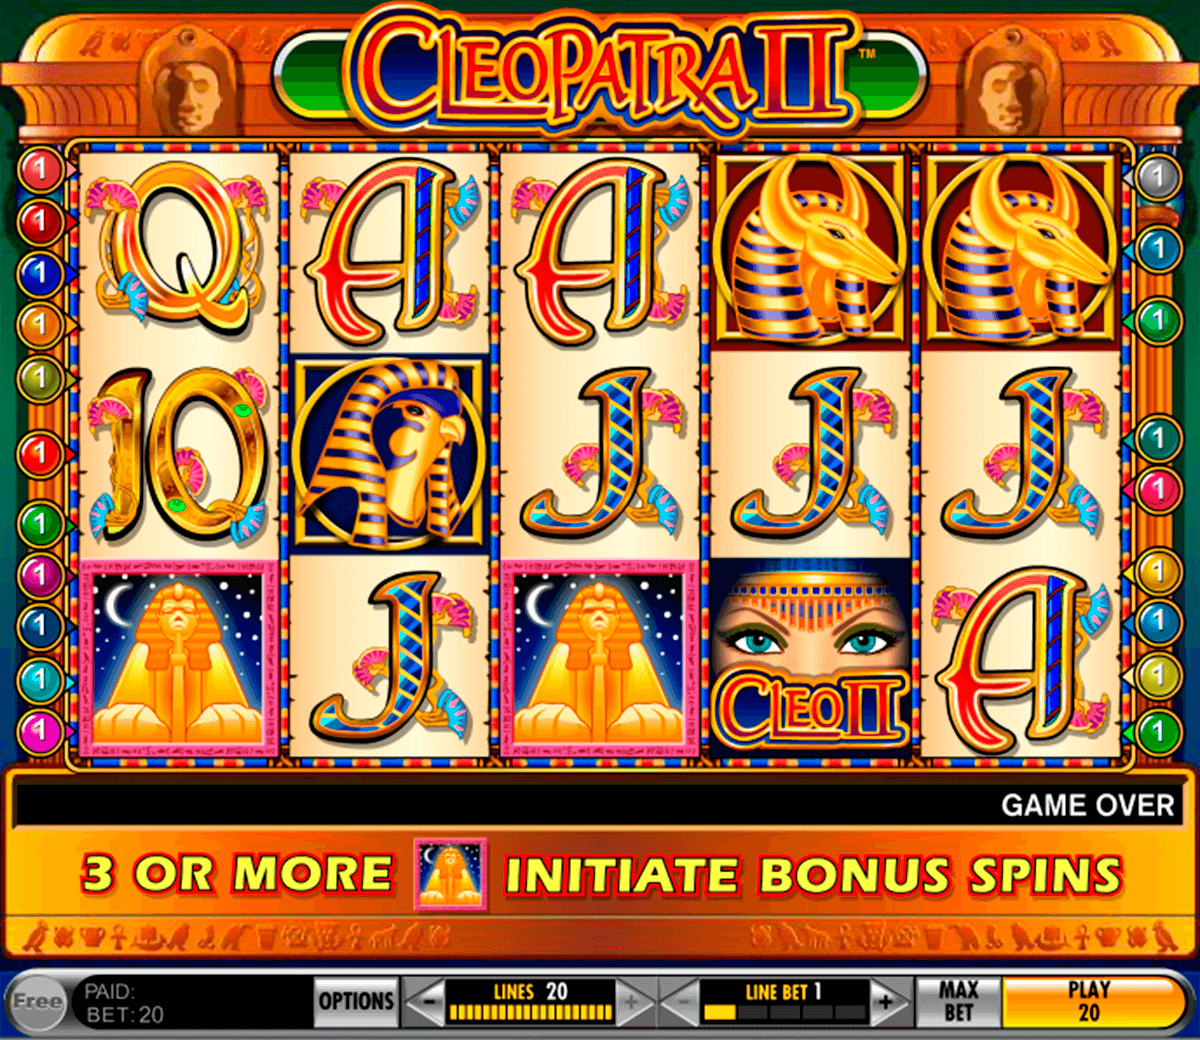 Casino con créditos gratis jackpot city tragamonedas-769246